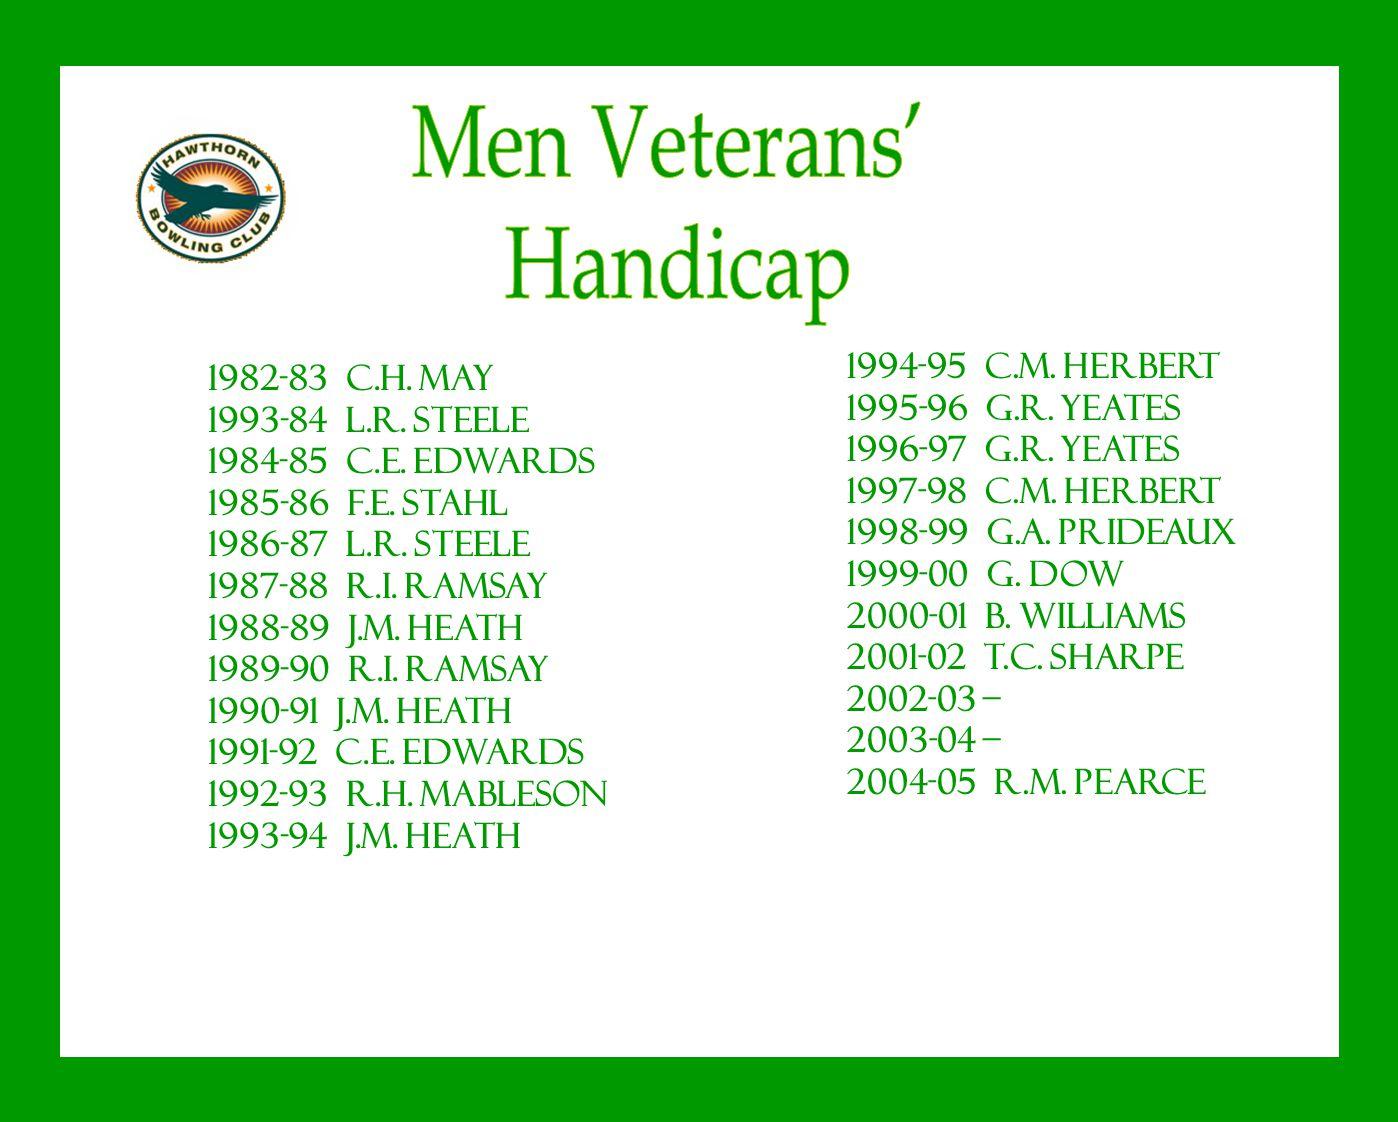 1994-95 C.M. HERBERT 1995-96 G.R. YEATES 1996-97 G.R. YEATES 1997-98 C.M. HERBERT 1998-99 G.A. PRIDEAUX 1999-00 G. DOW 2000-01 B. WILLIAMS 2001-02 T.C